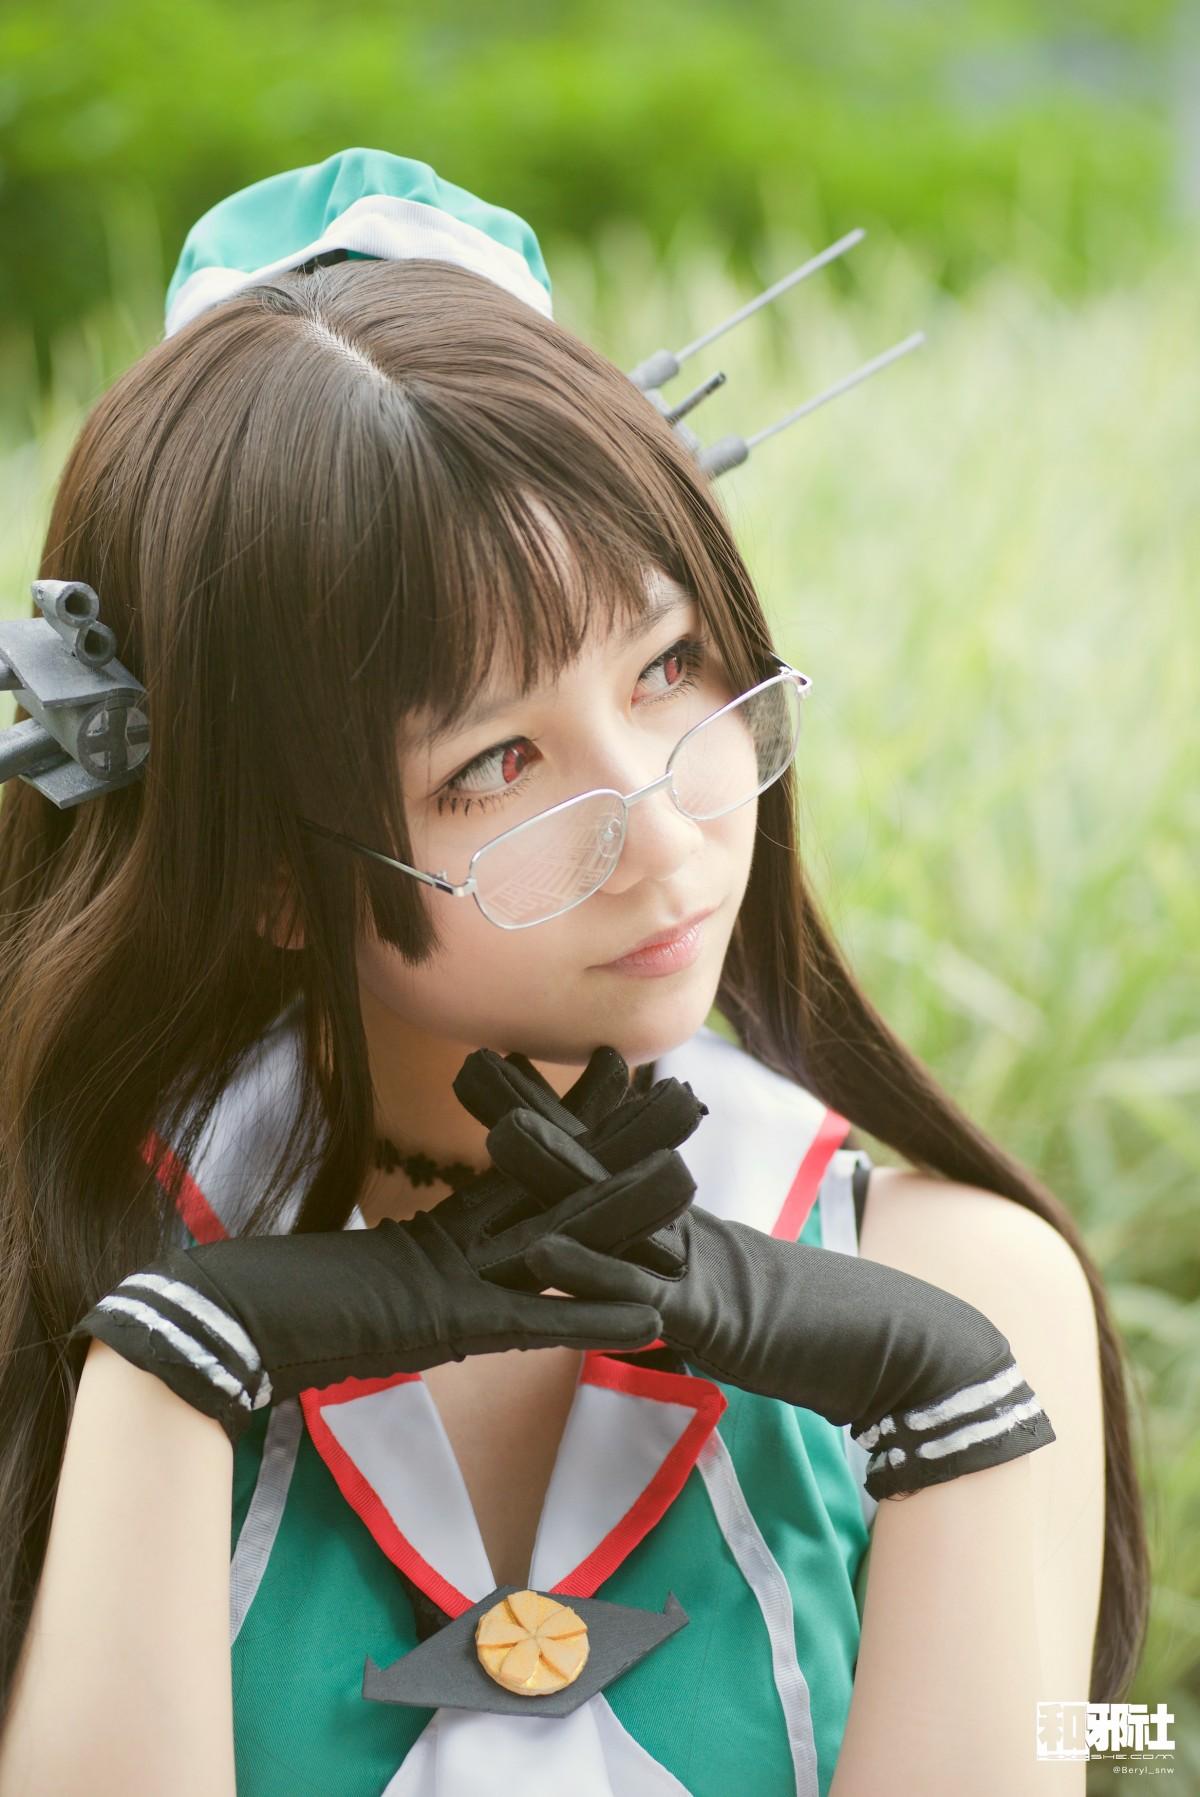 Free Images : girl, cute, portrait, nikon, clothing, face ...